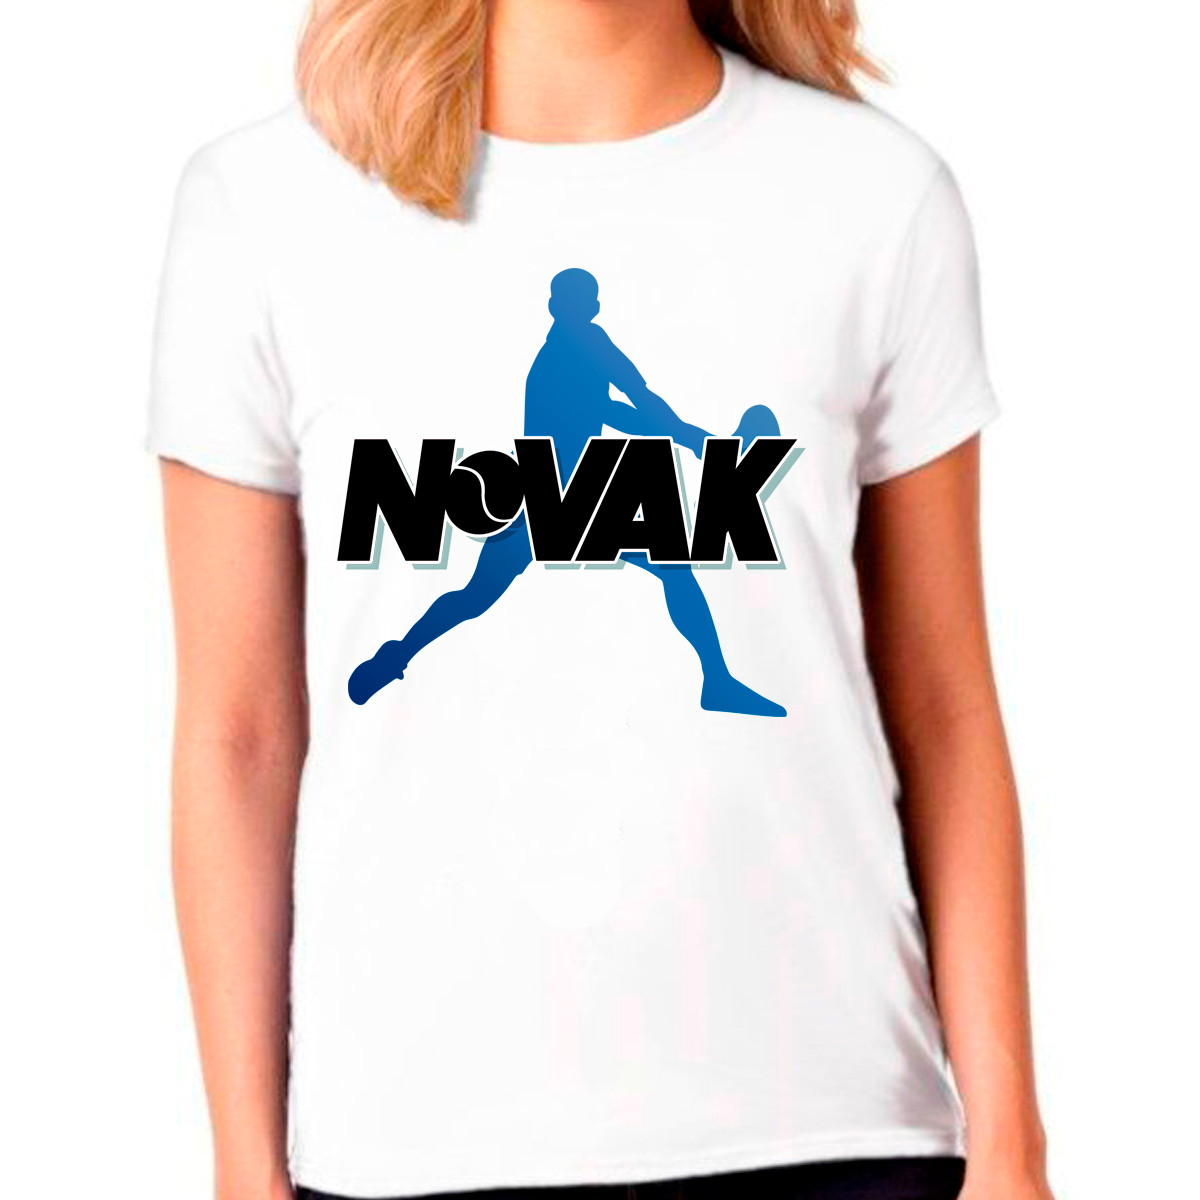 Camisa Camiseta Novak Djokovic Tennis Esporte Baby Look no Elo7 | CAMISETAS DESIGN (1164877)